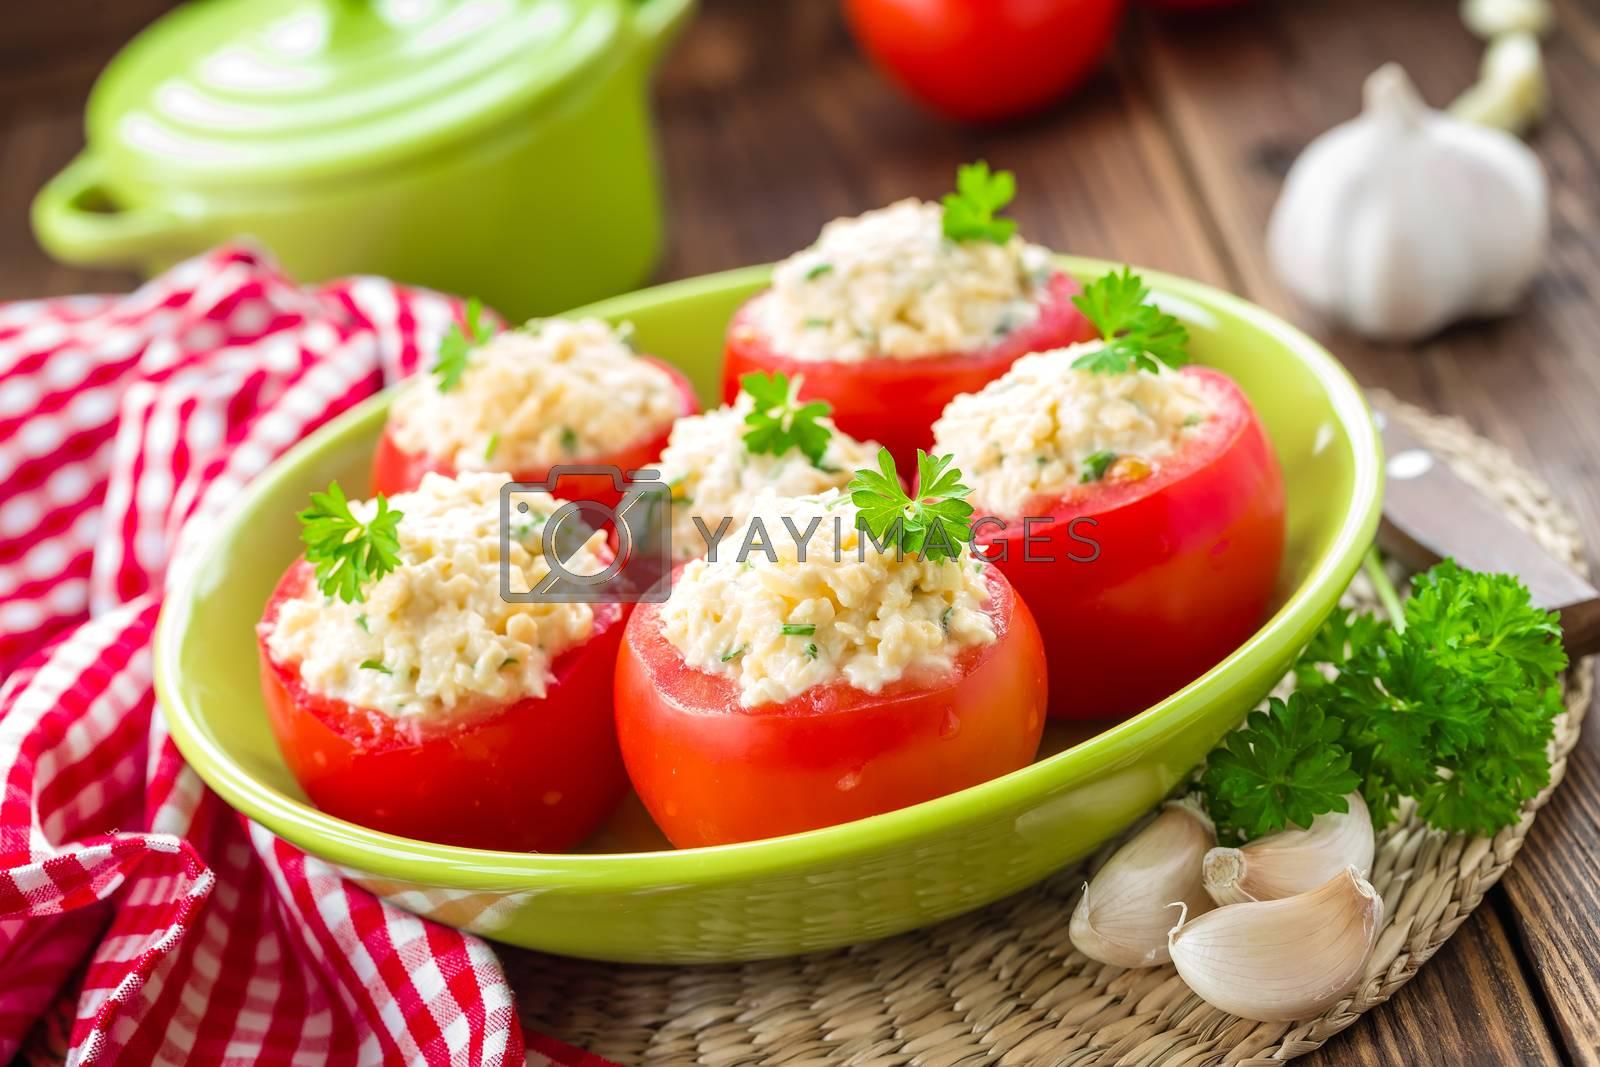 Royalty free image of Stuffed tomatoes by yelenayemchuk